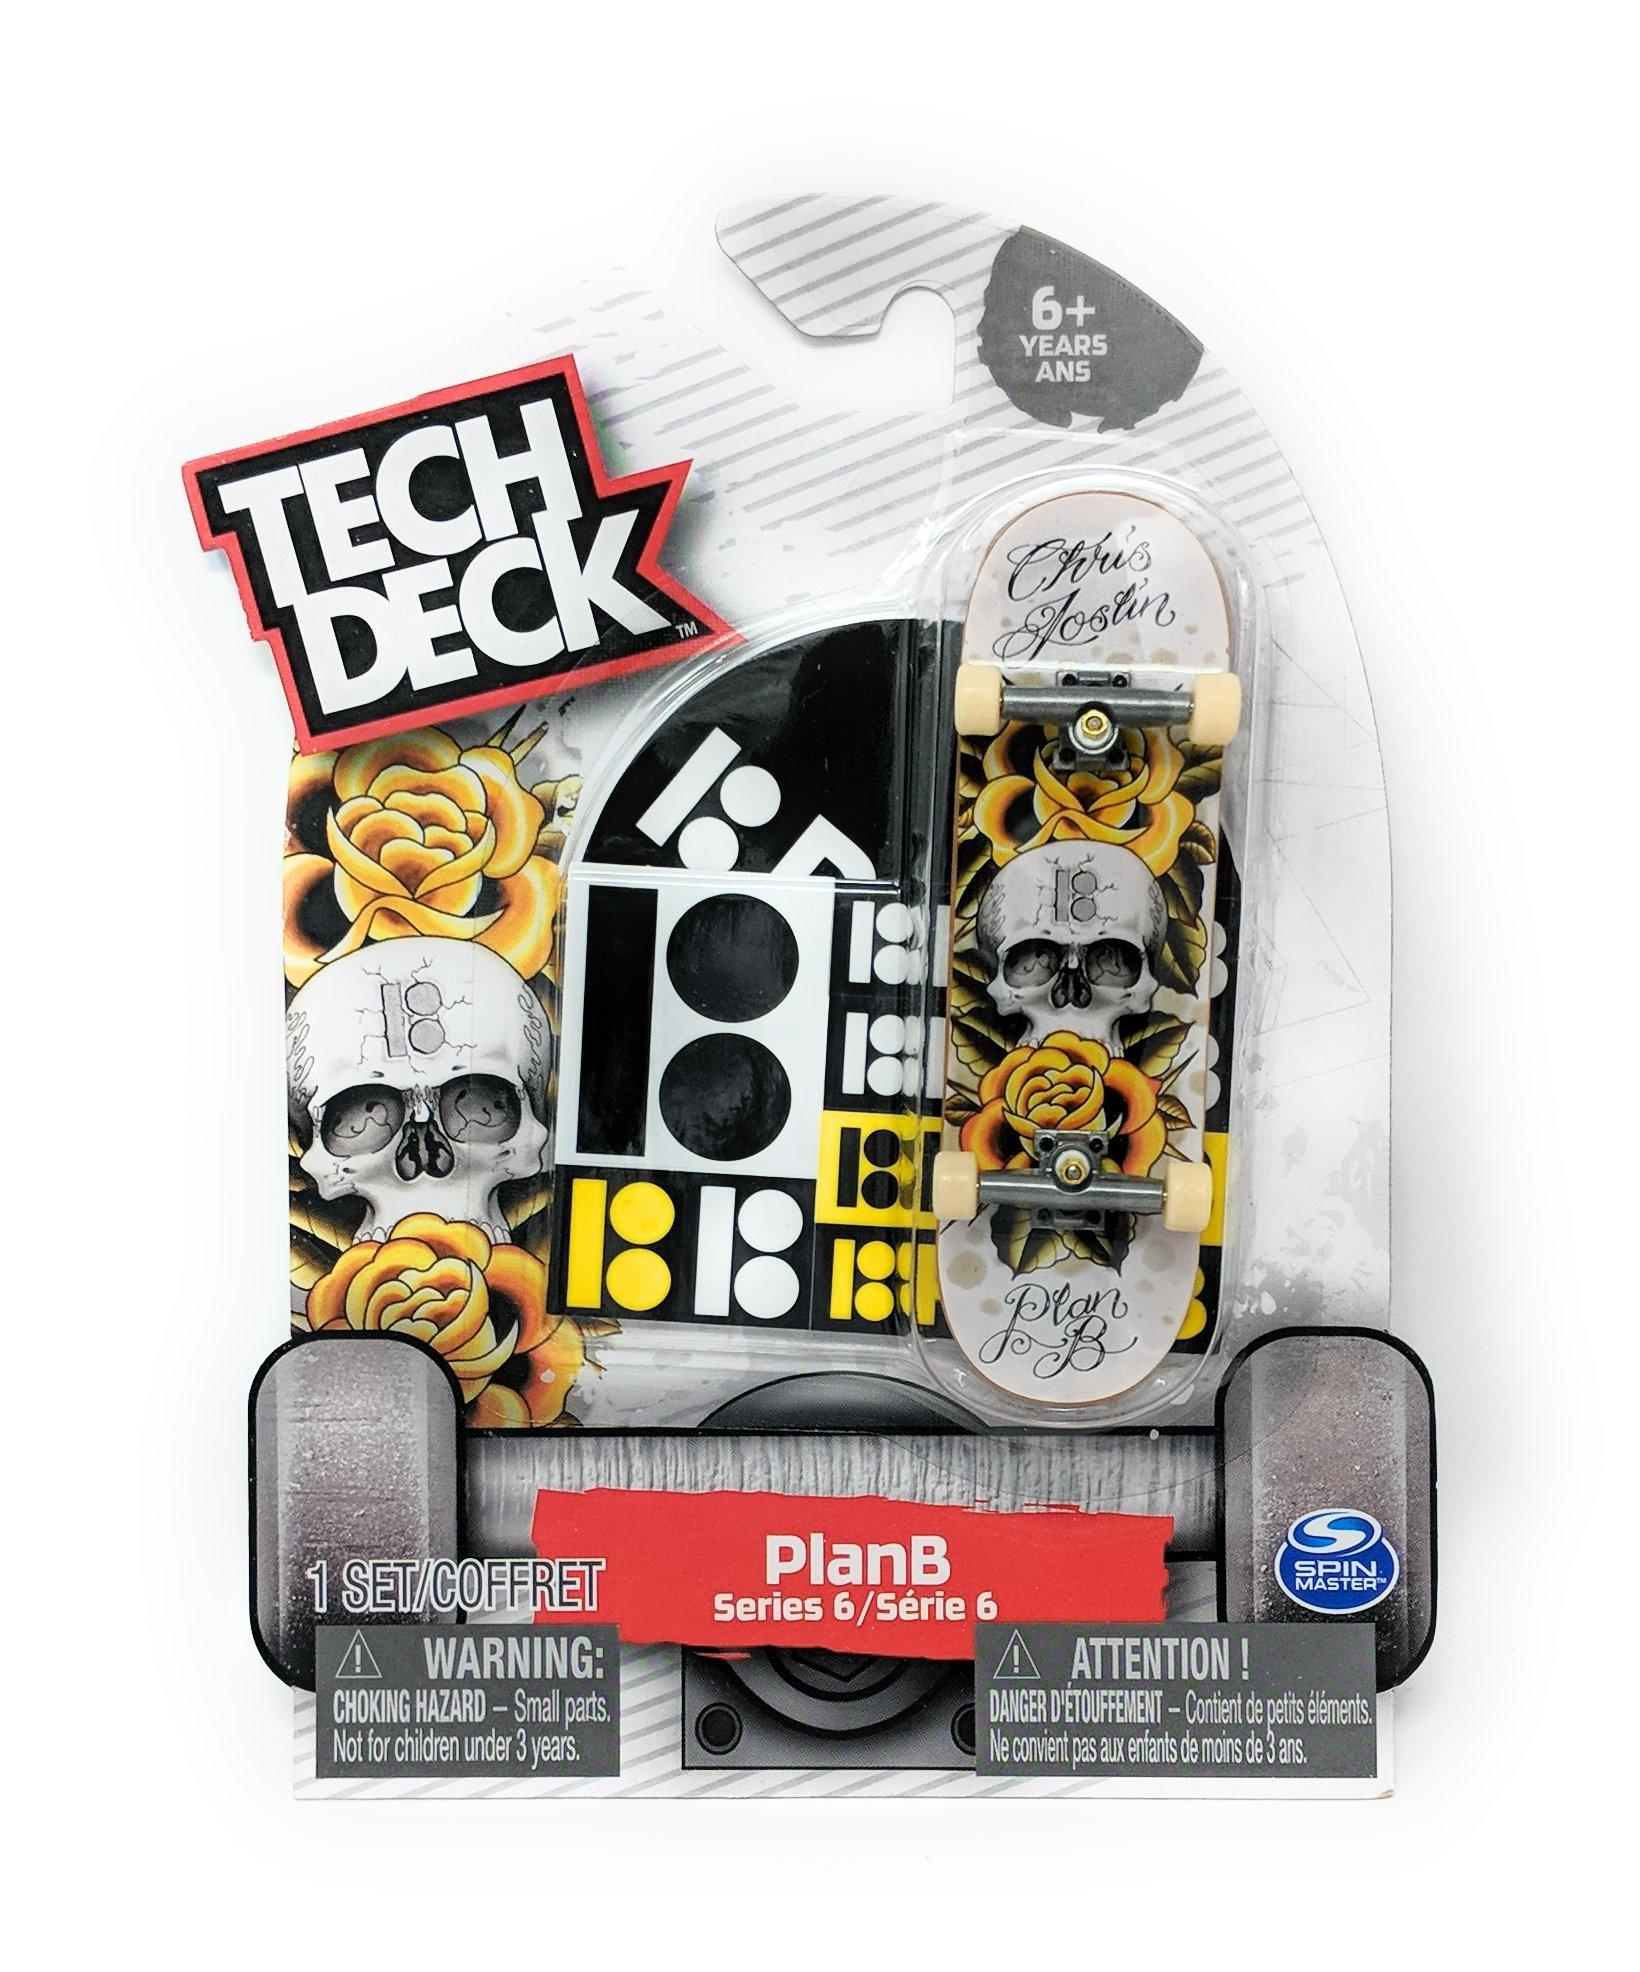 fingerboard Tech Deck PLAN B Series 6 Skull and Roses Chris Joslin Rare #20087773